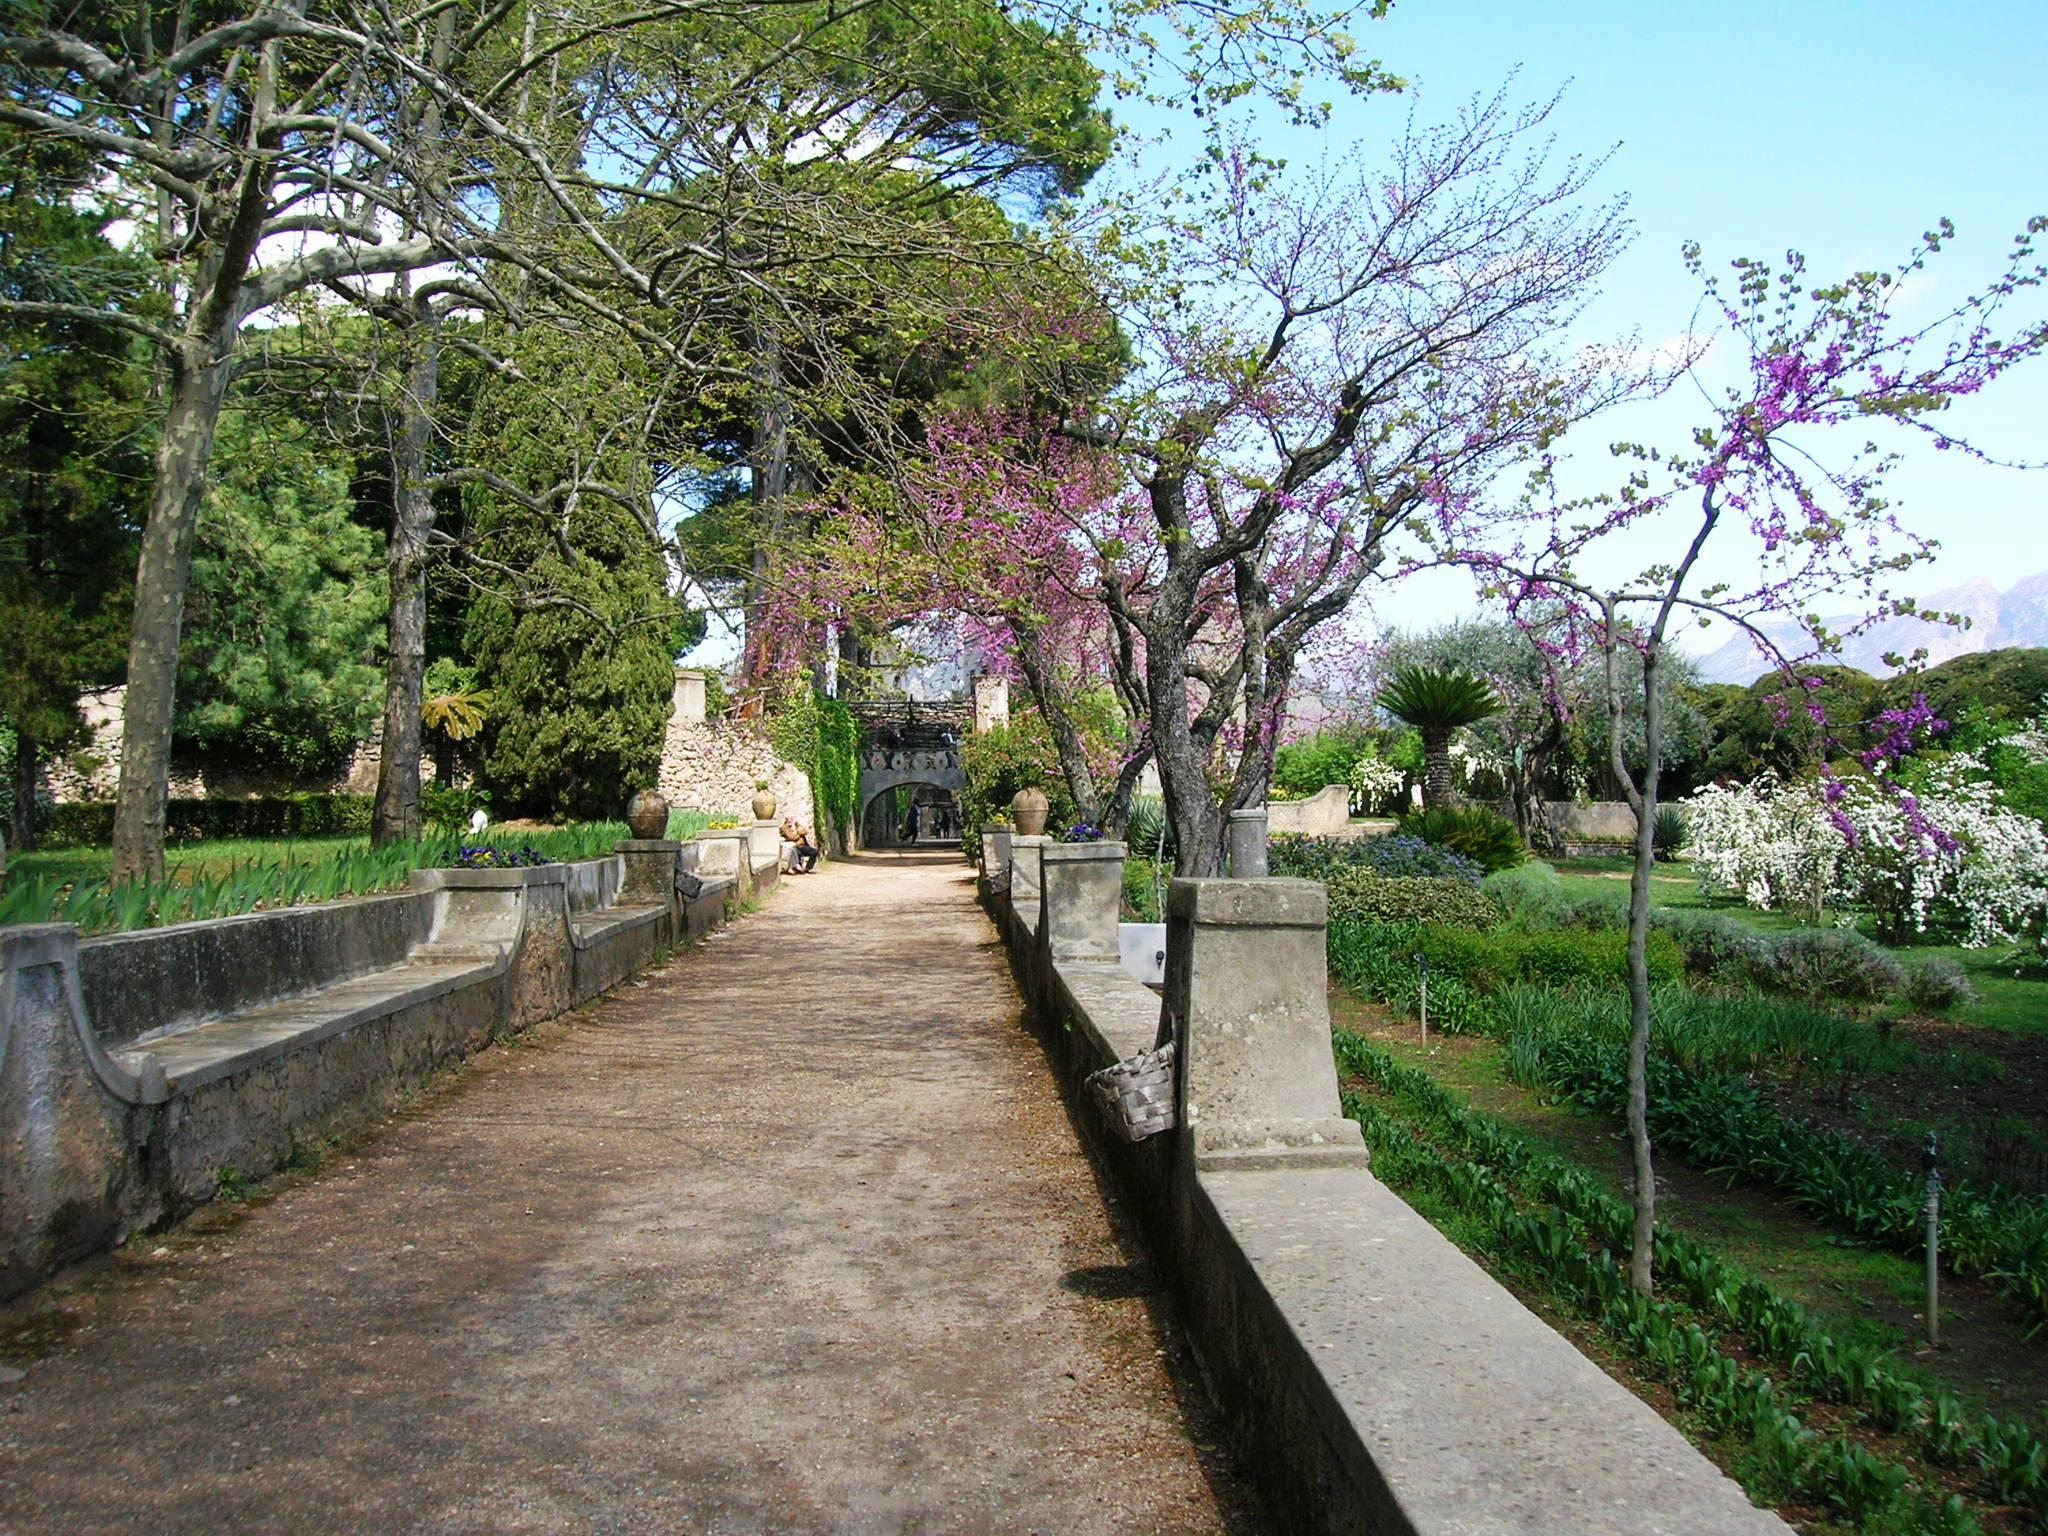 Villa_Cimbrone_Ravello by Mentnafunangann.JPG